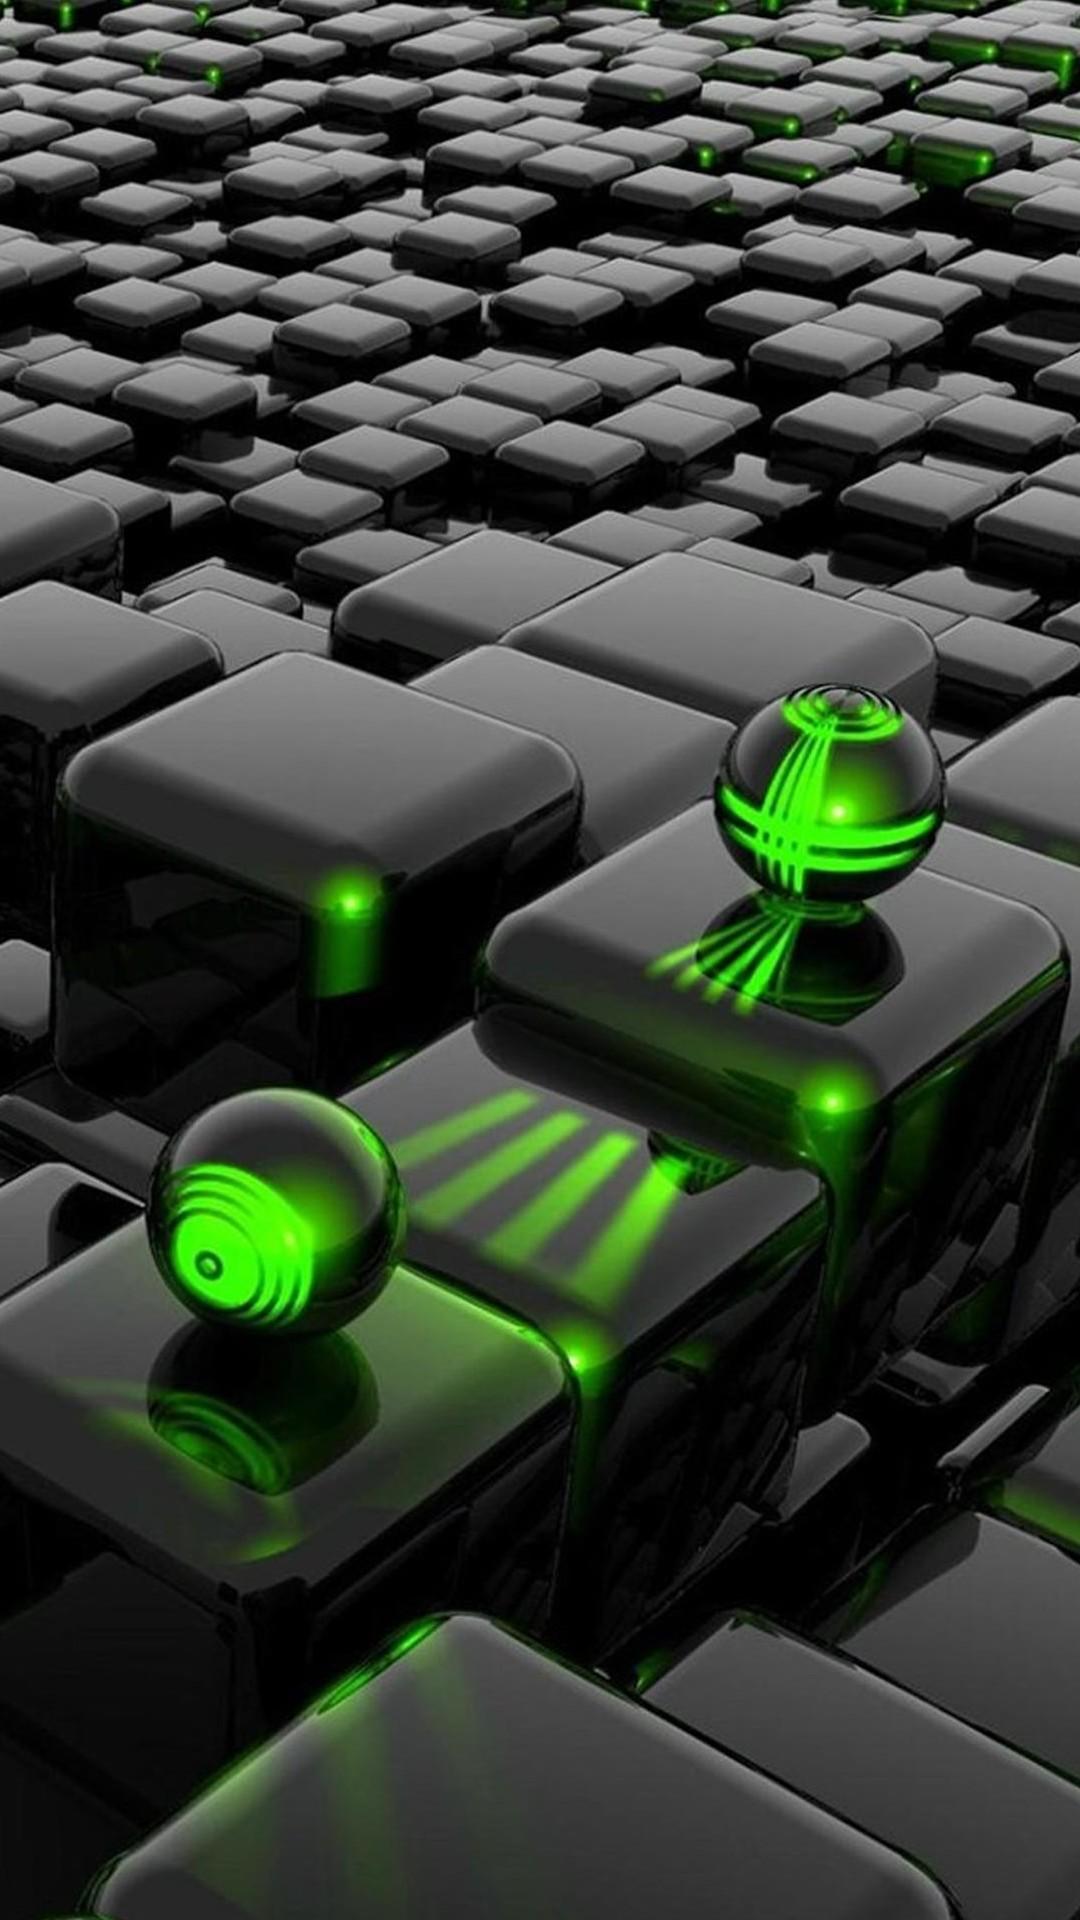 3D Cubes And 3D Green Laser